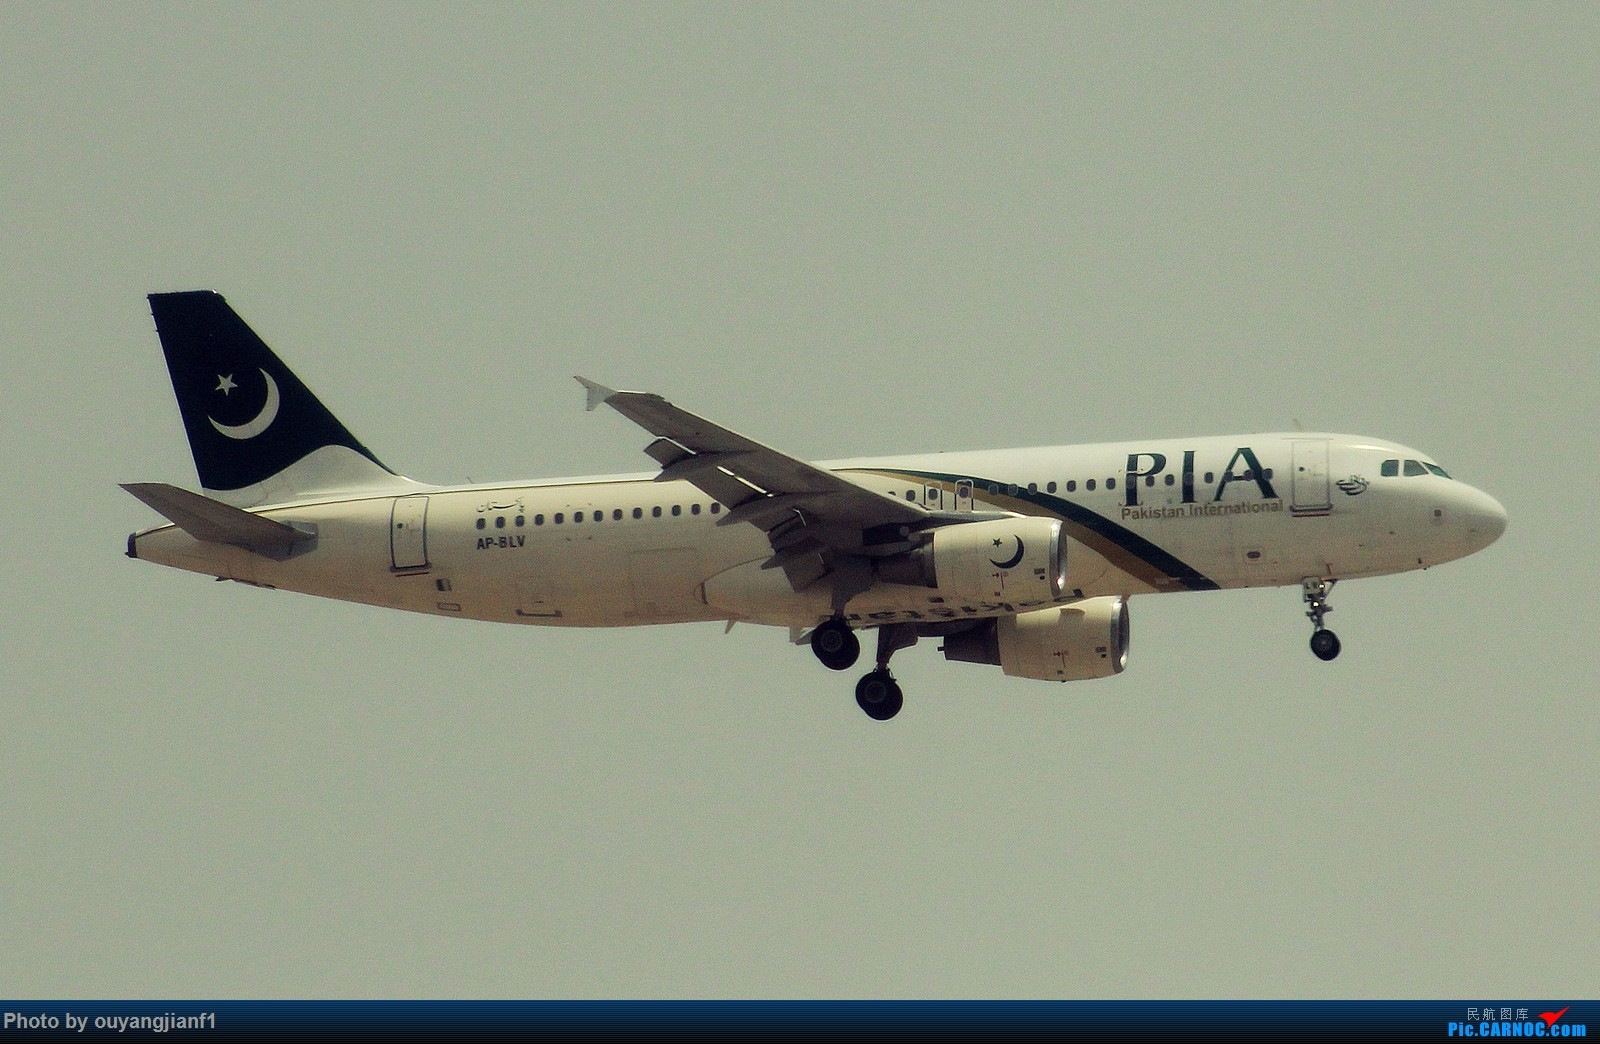 Re:[原创]很多年没有来贴图区了,记一次本不在计划中的迪拜拍机之行,在漫天黄沙中EK的380和777真的看到吐血.... AIRBUS A320-200 AP-BLV 阿拉伯联合酋长国迪拜国际机场